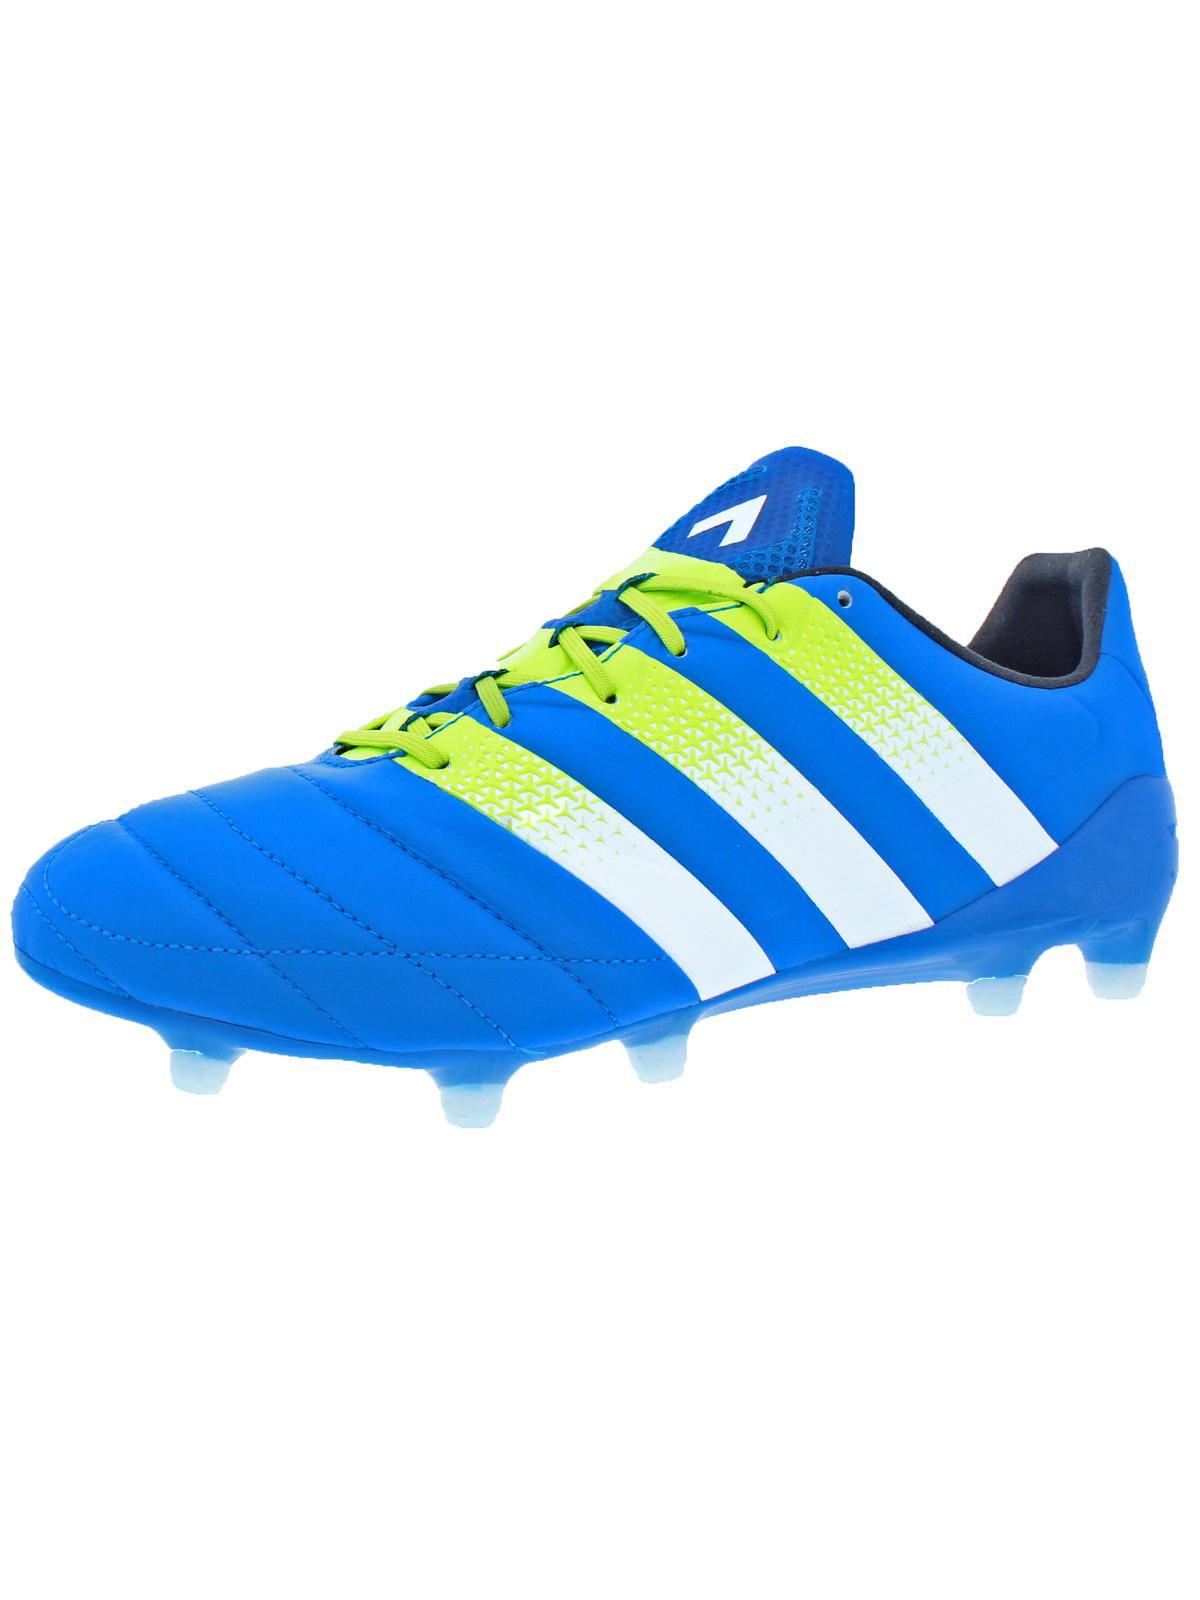 Adidas Mens Ace 16.1 FG AG Soccer Performance Soccer Shoes Blue 8.5 Medium (D) by Adidas